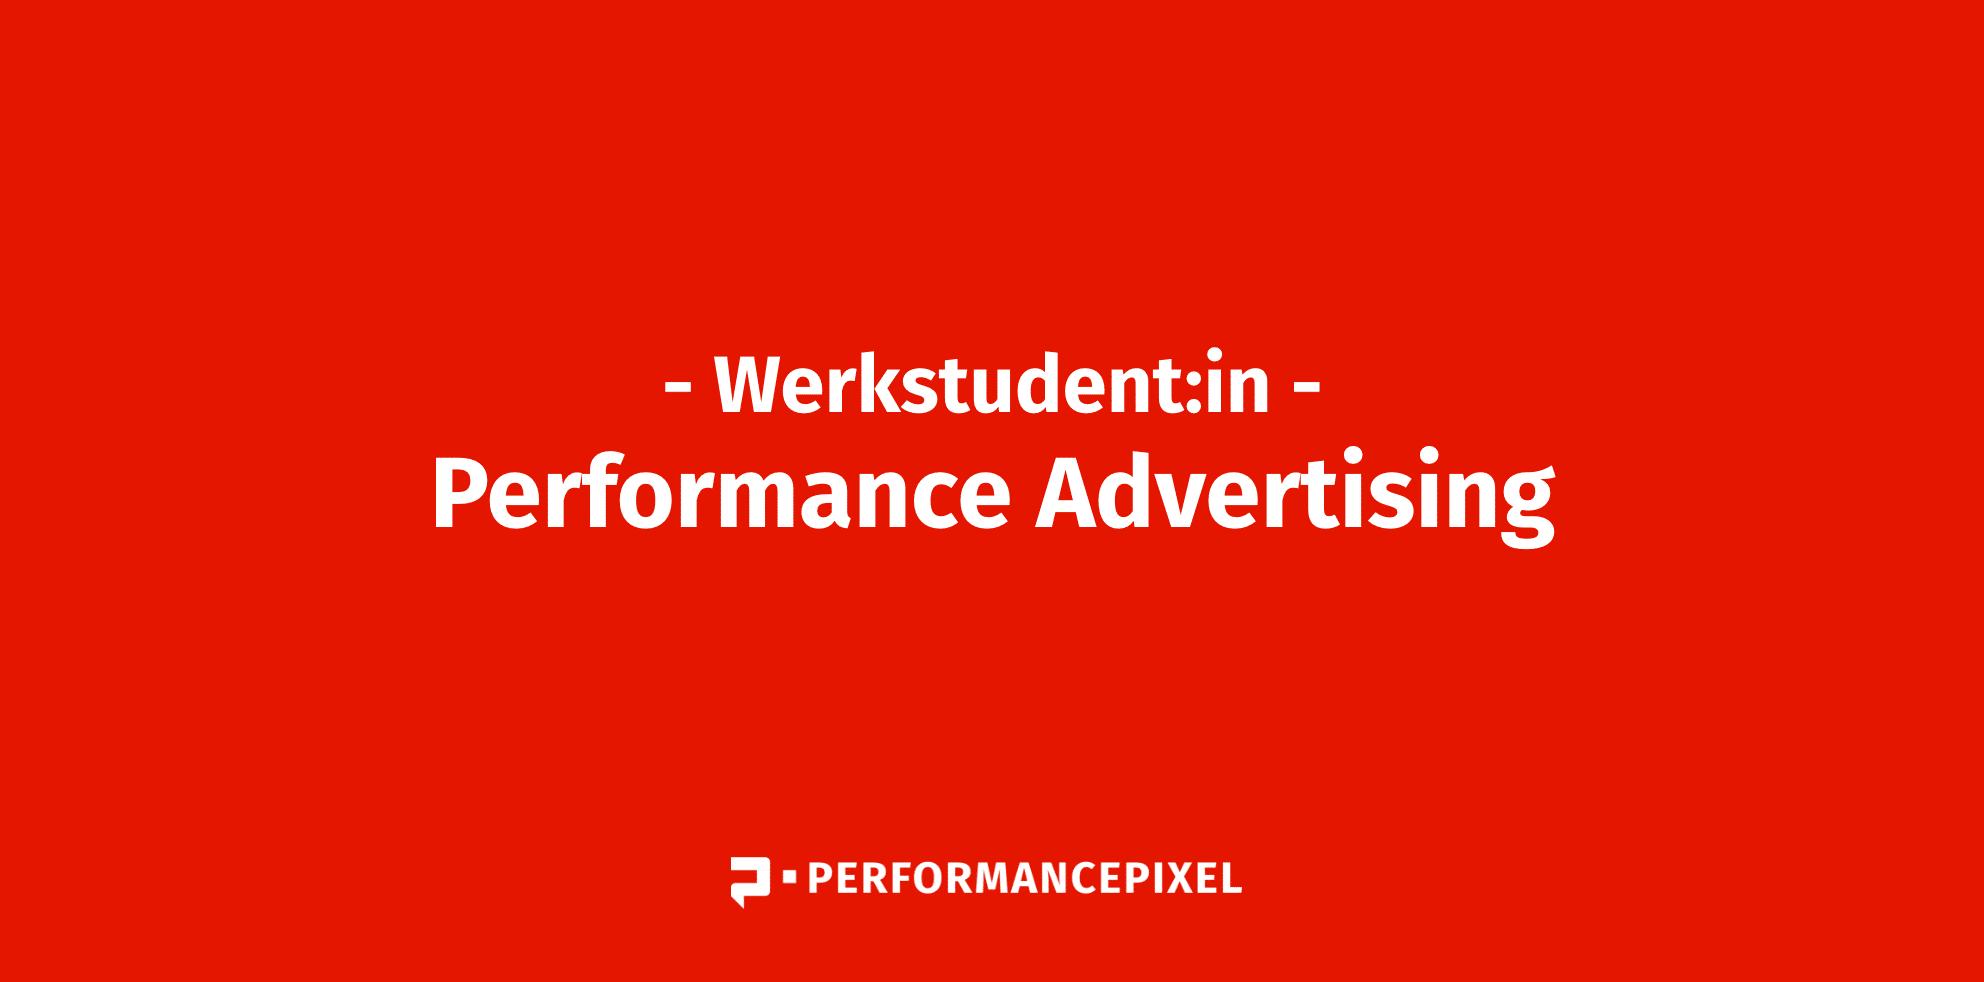 Werkstudent:in Performance Advertising